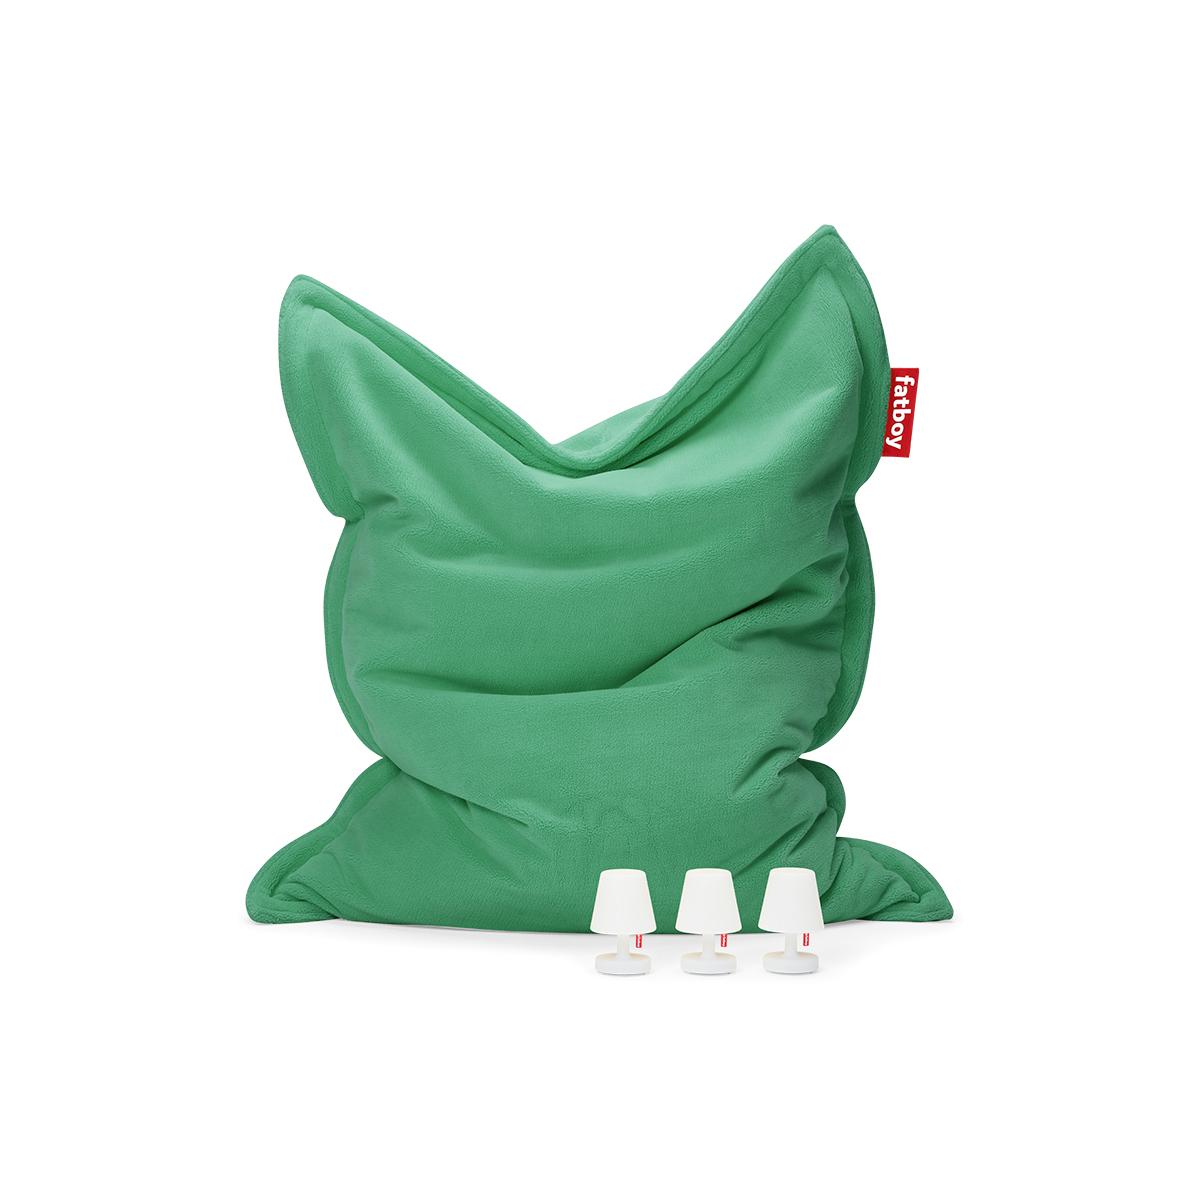 8719773032034 FATBOY Teddy marblegreen packshotplus 01